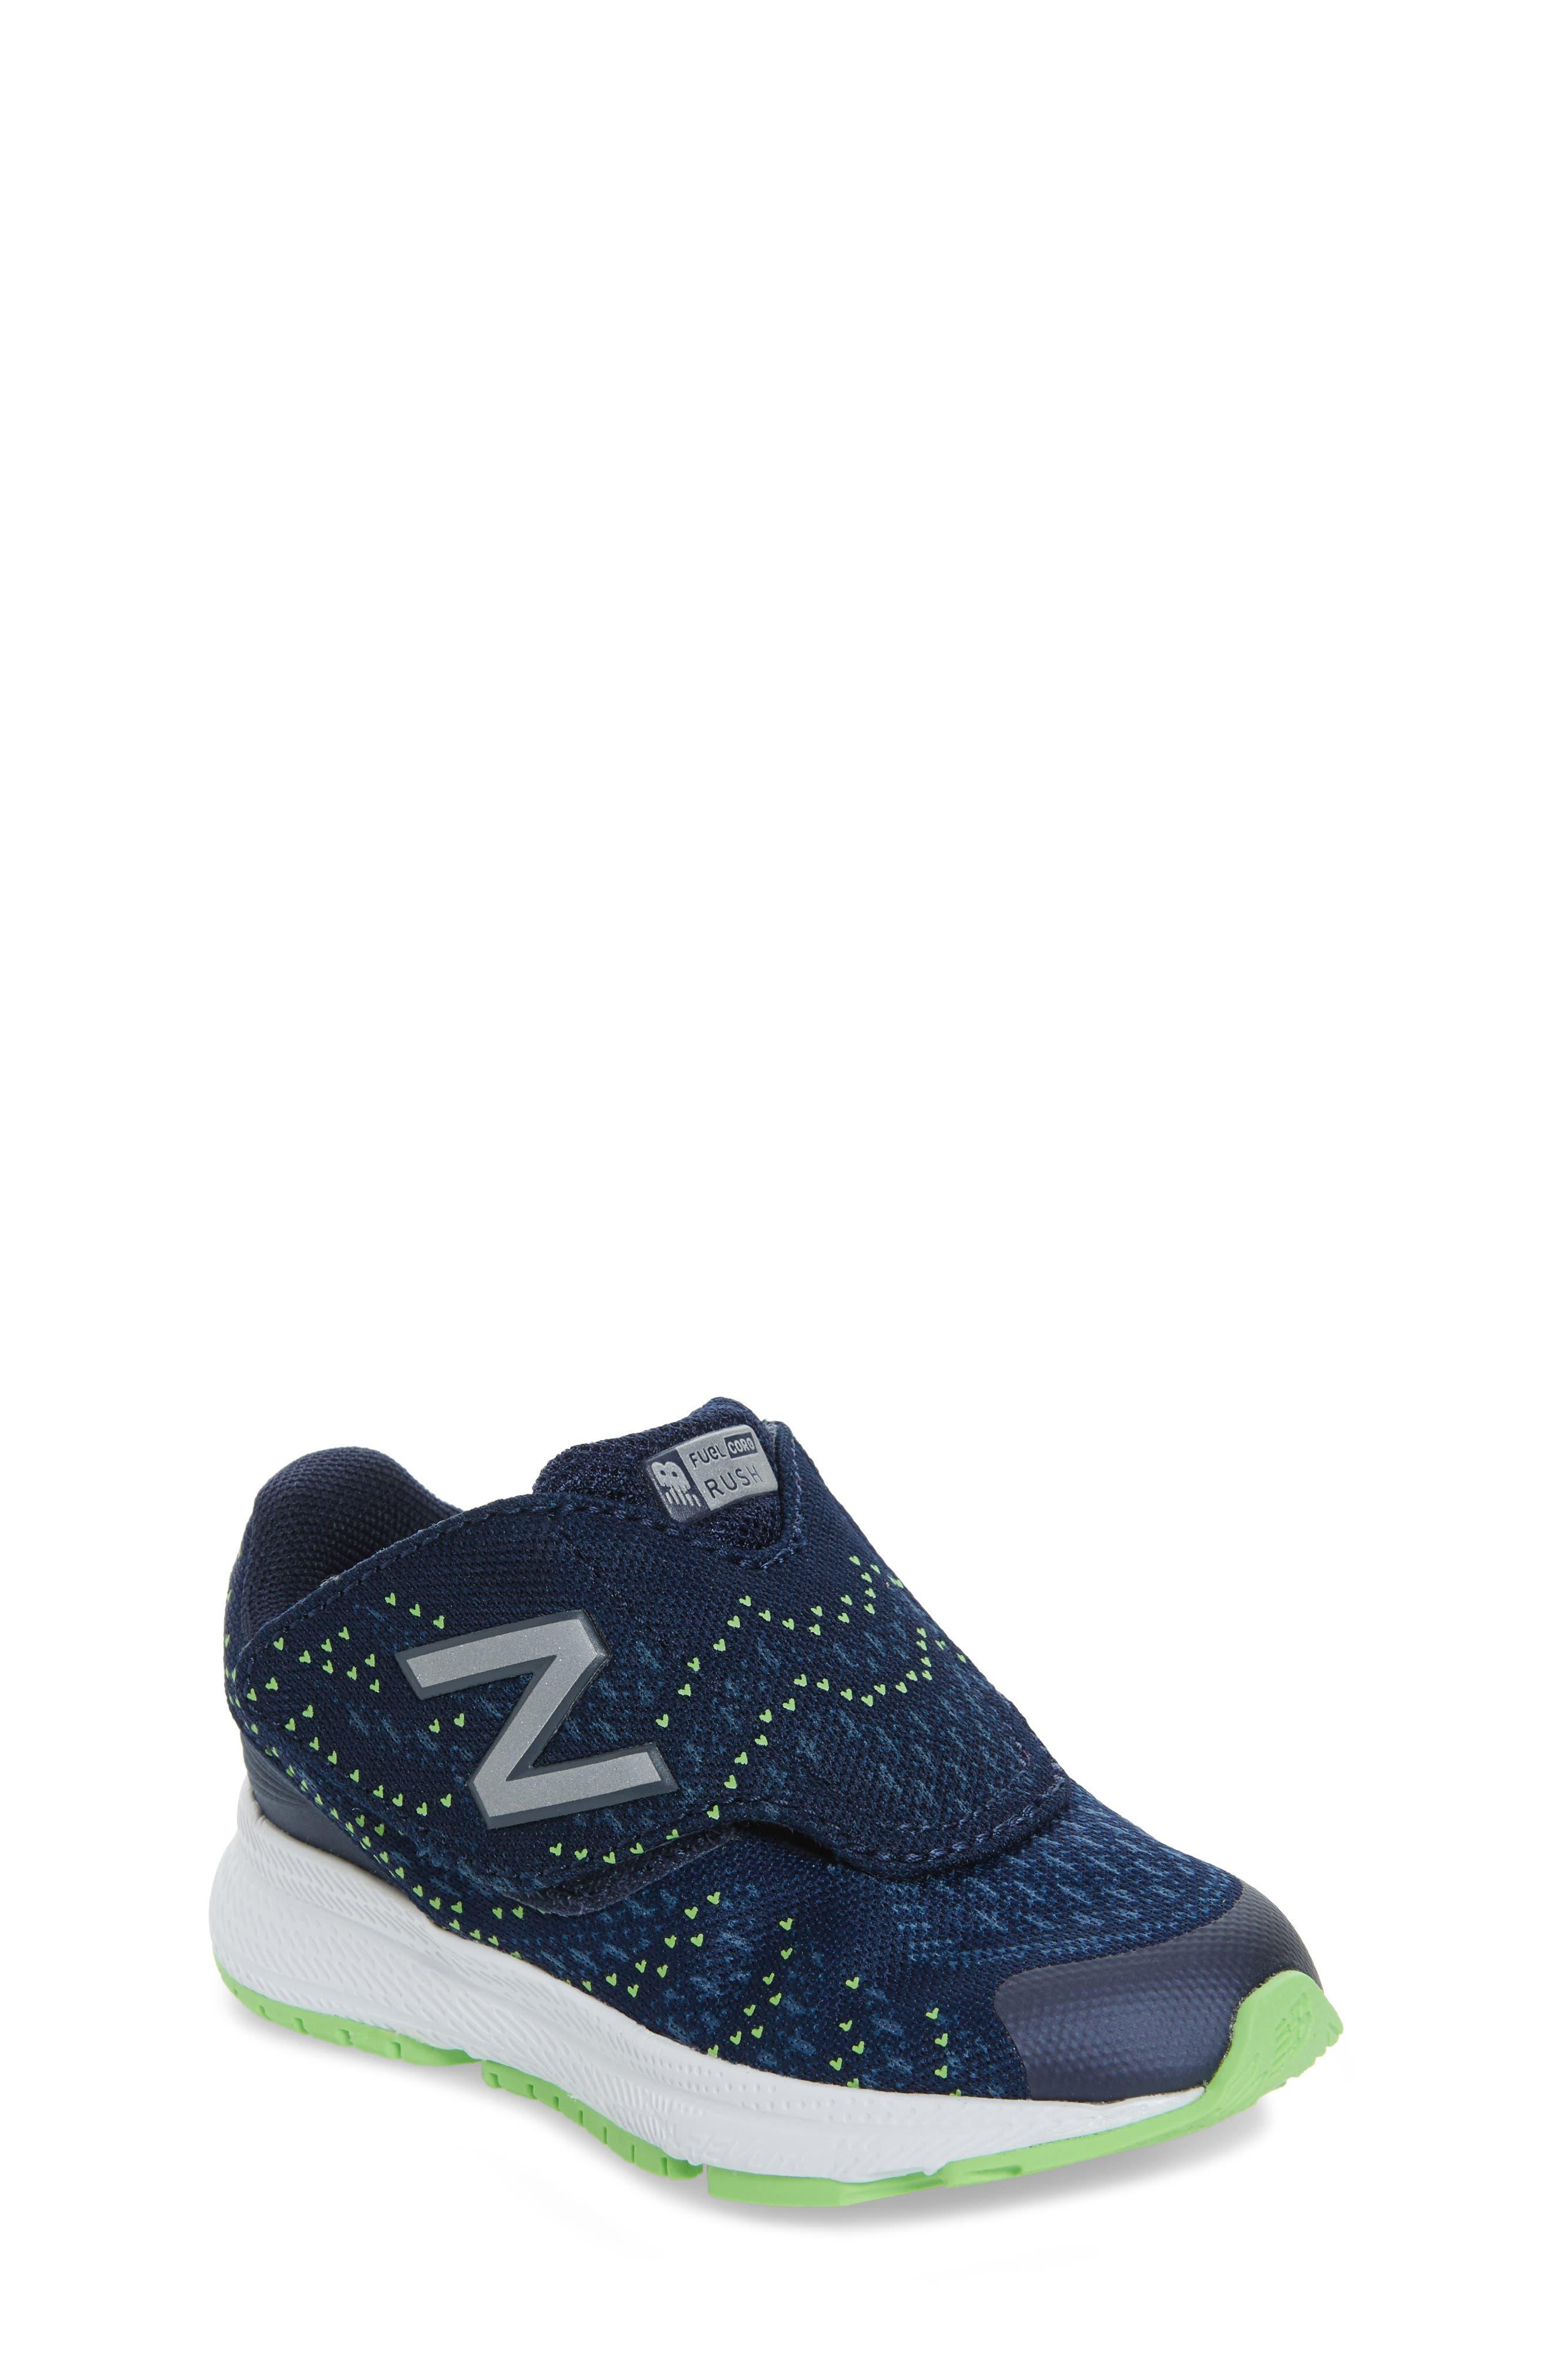 FuelCore Rush v3 Sneaker,                         Main,                         color, Navy